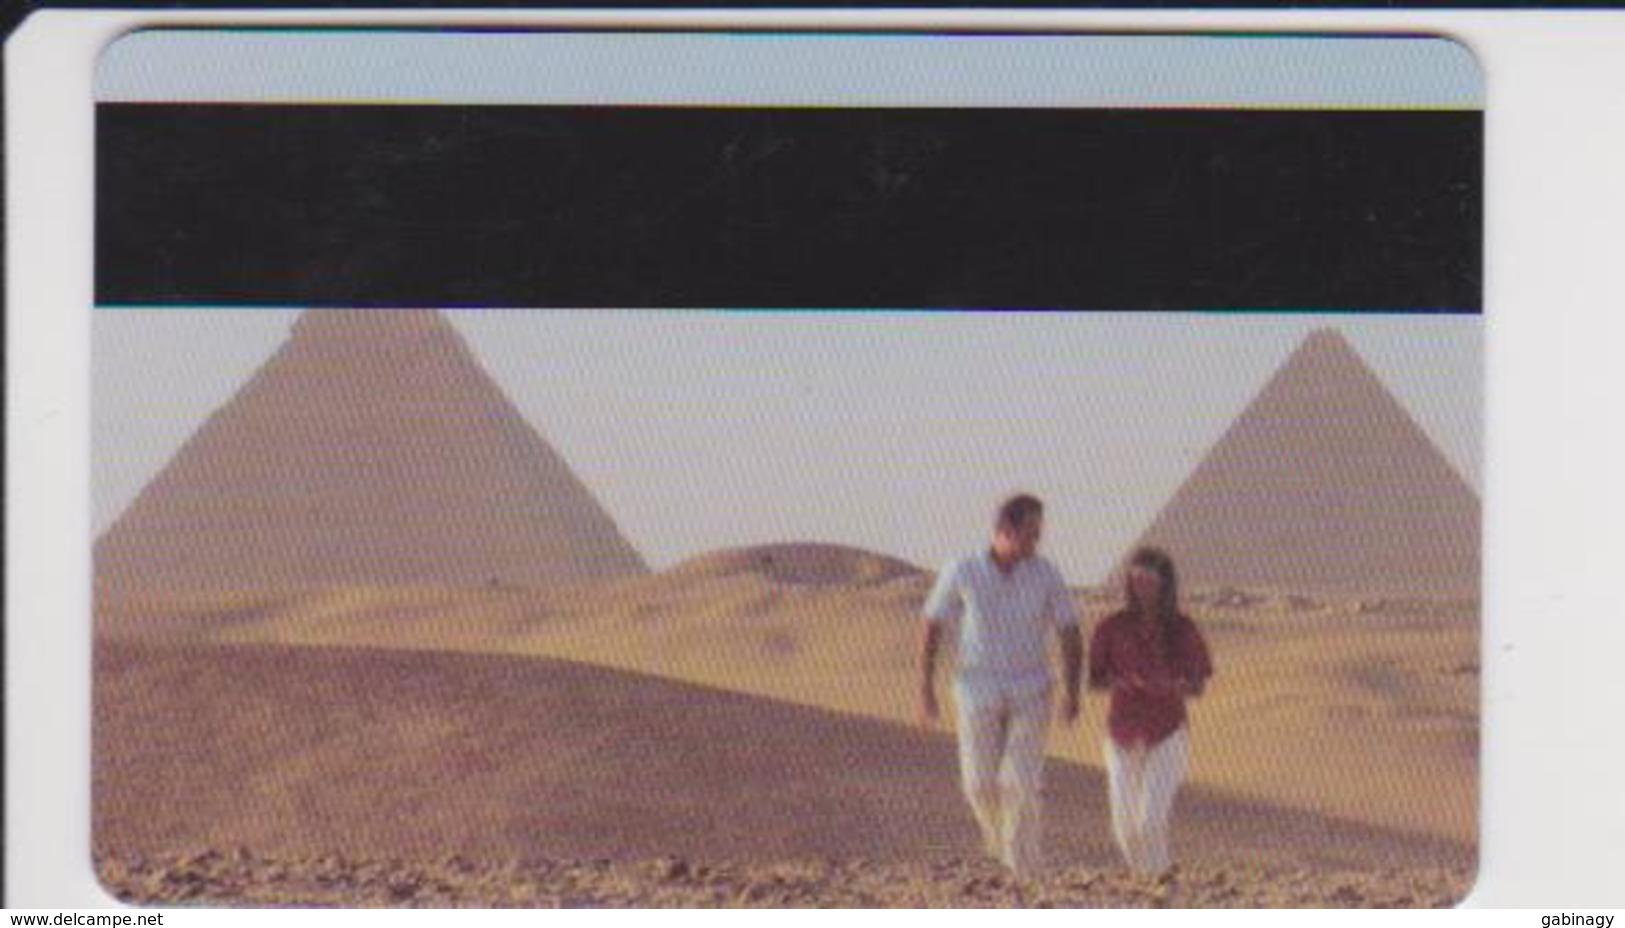 HOTEL KEYS - 2116 - EGYPT - SEMIRAMIS INTERCONTINENTAL CAIRO - PYRAMID - Cartas De Hotels